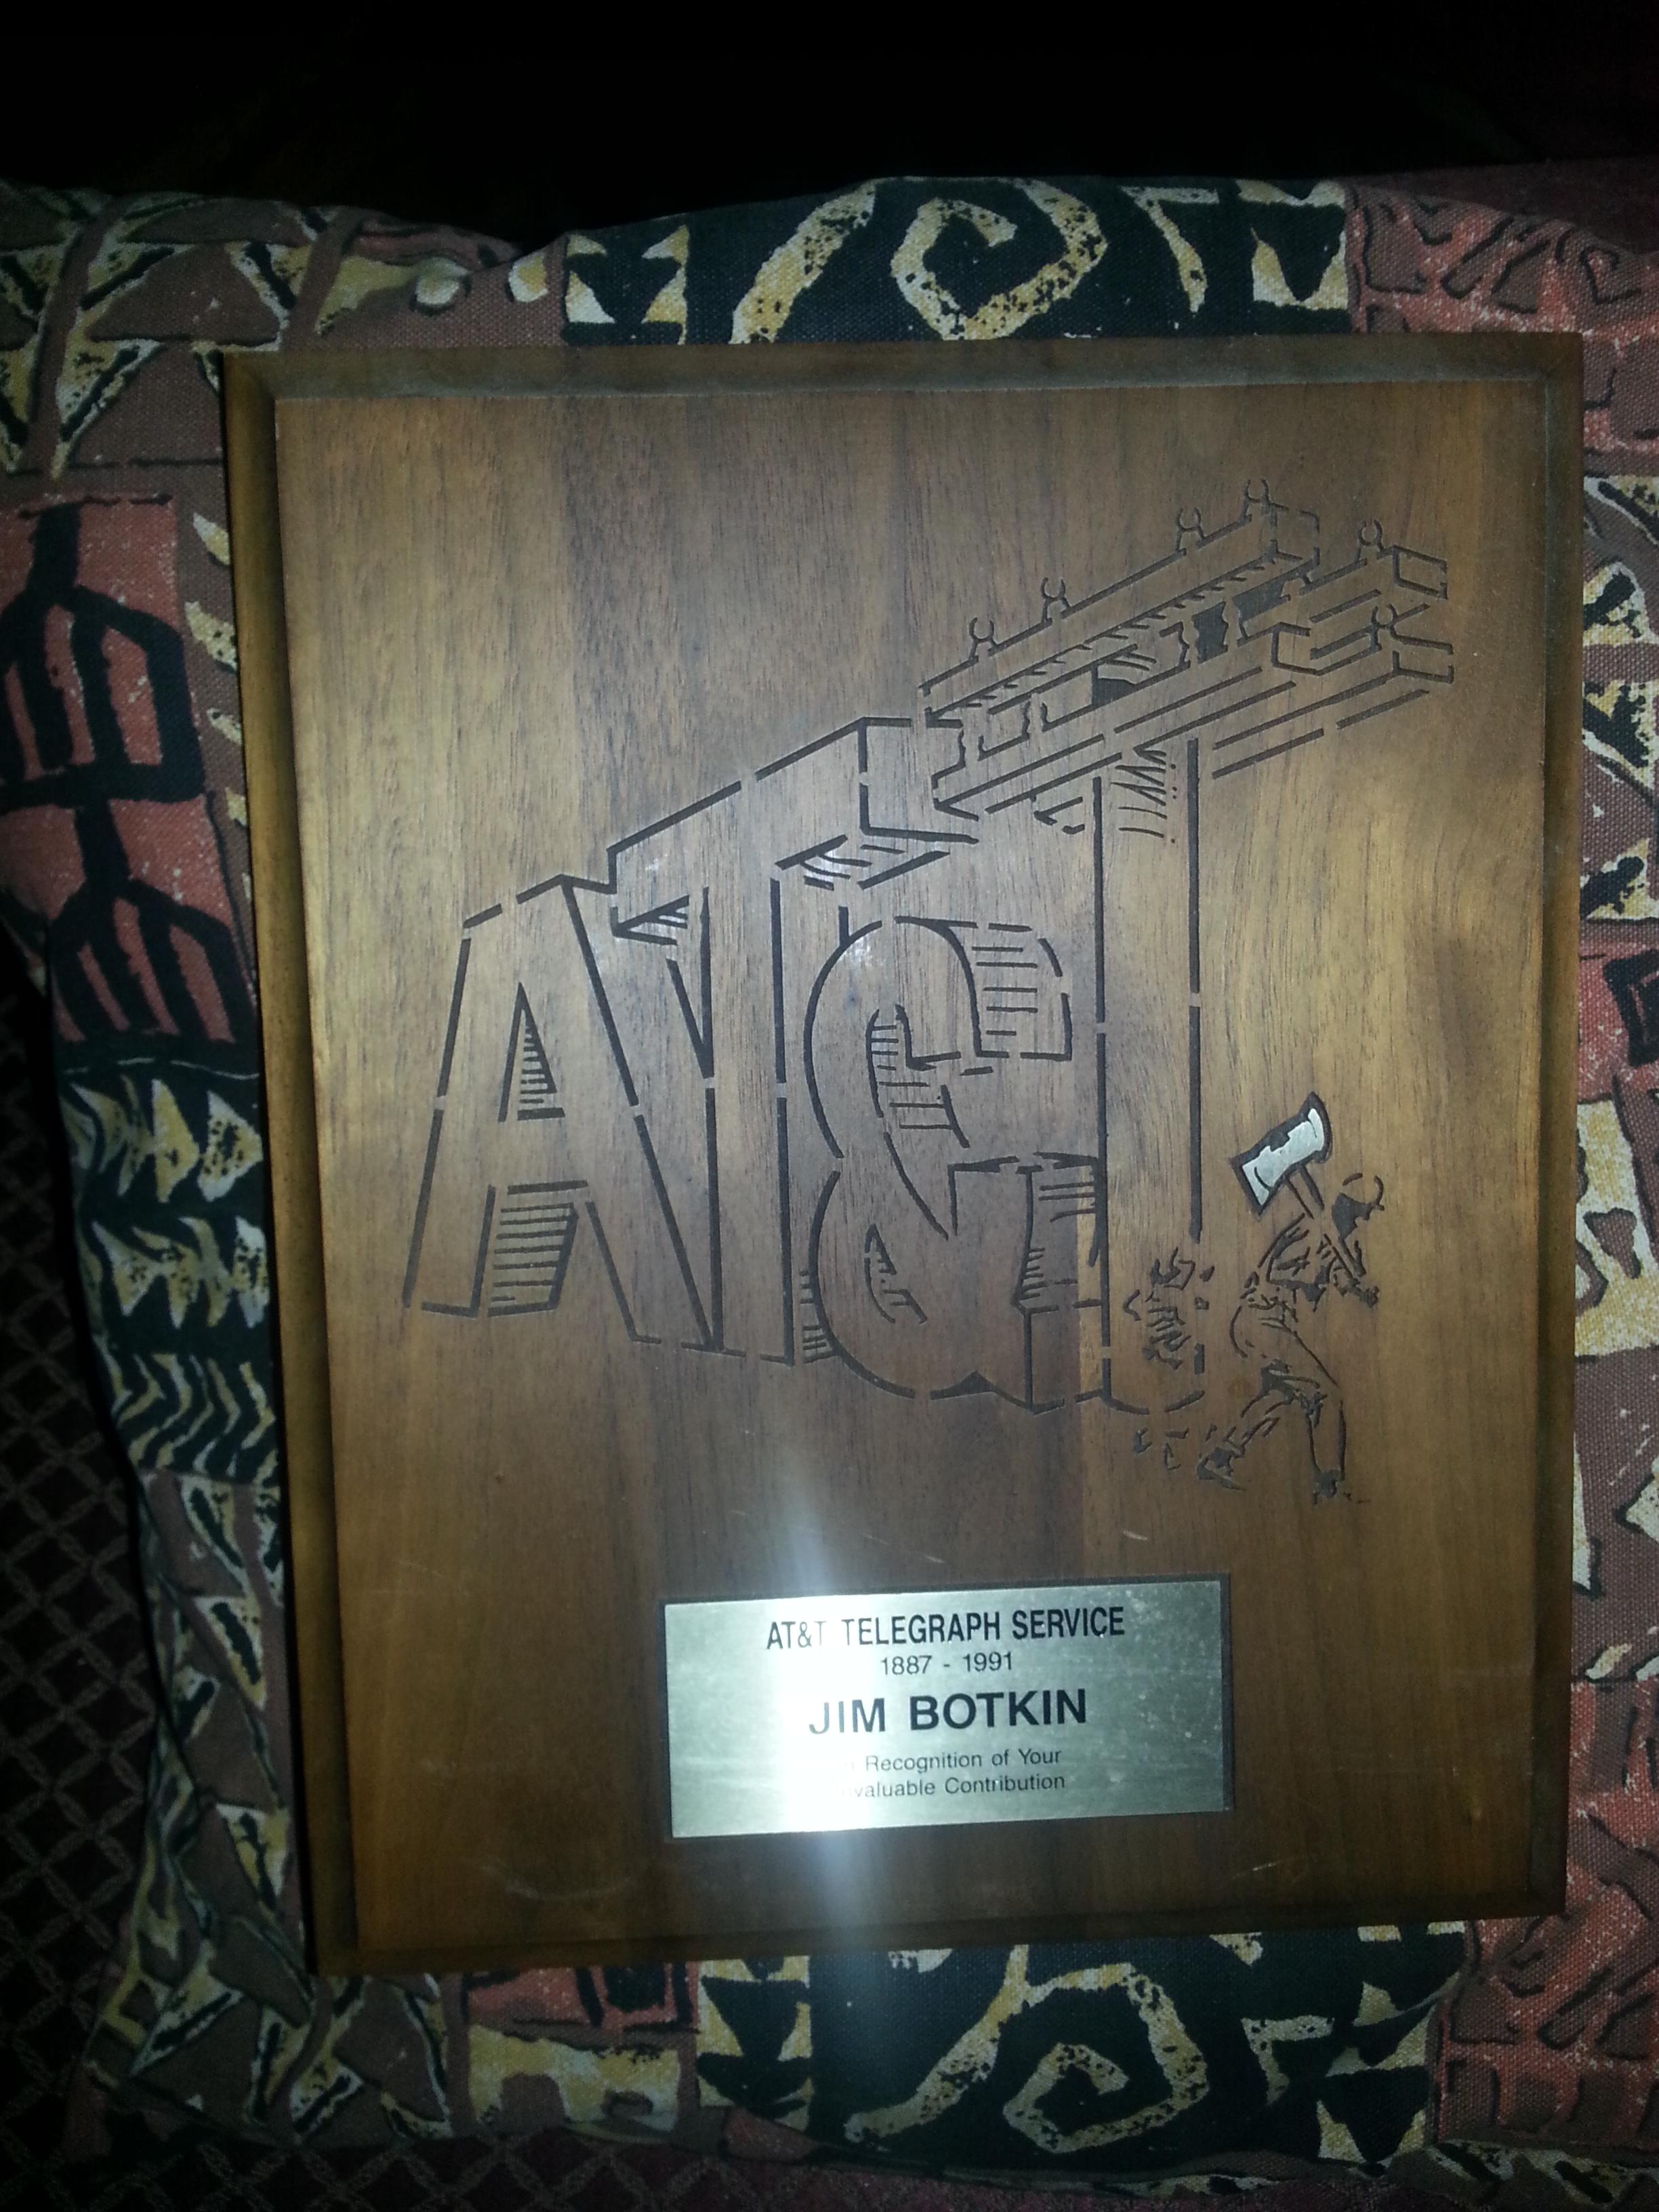 AT&T Jim Botkin 30 Years